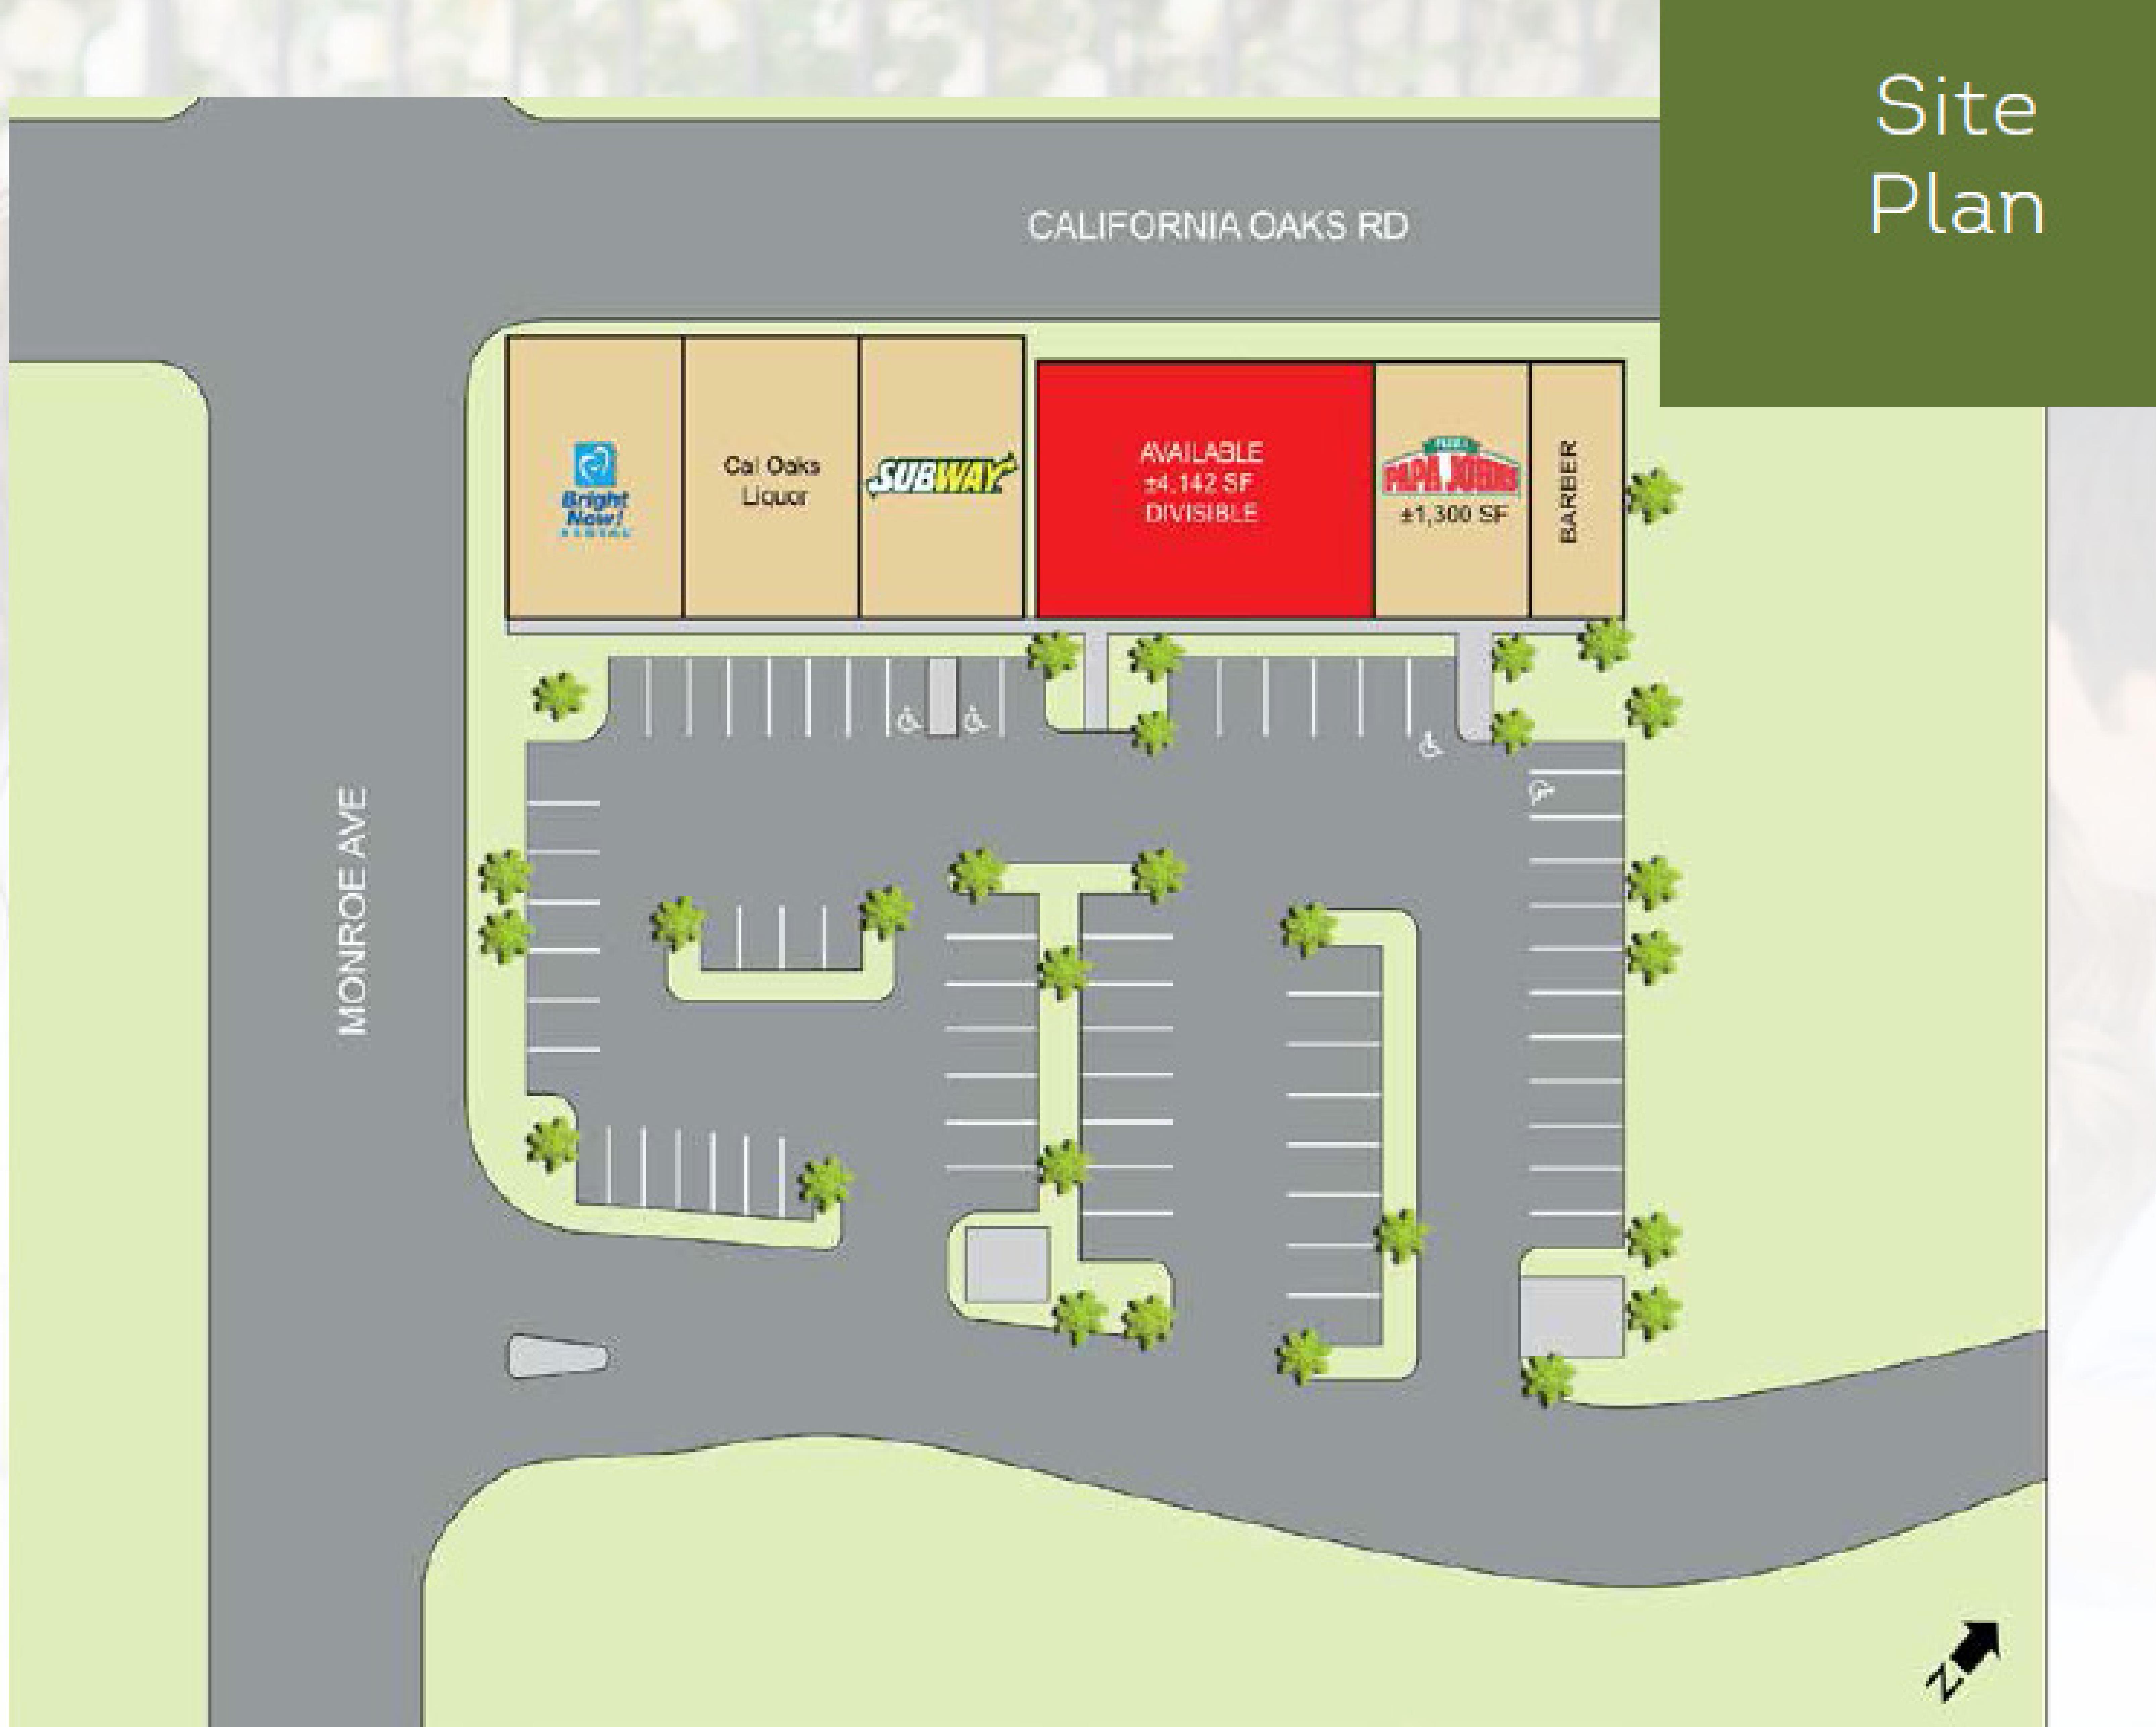 Cal Oaks-Murrieta-40770 California Oaks Rd: site plan